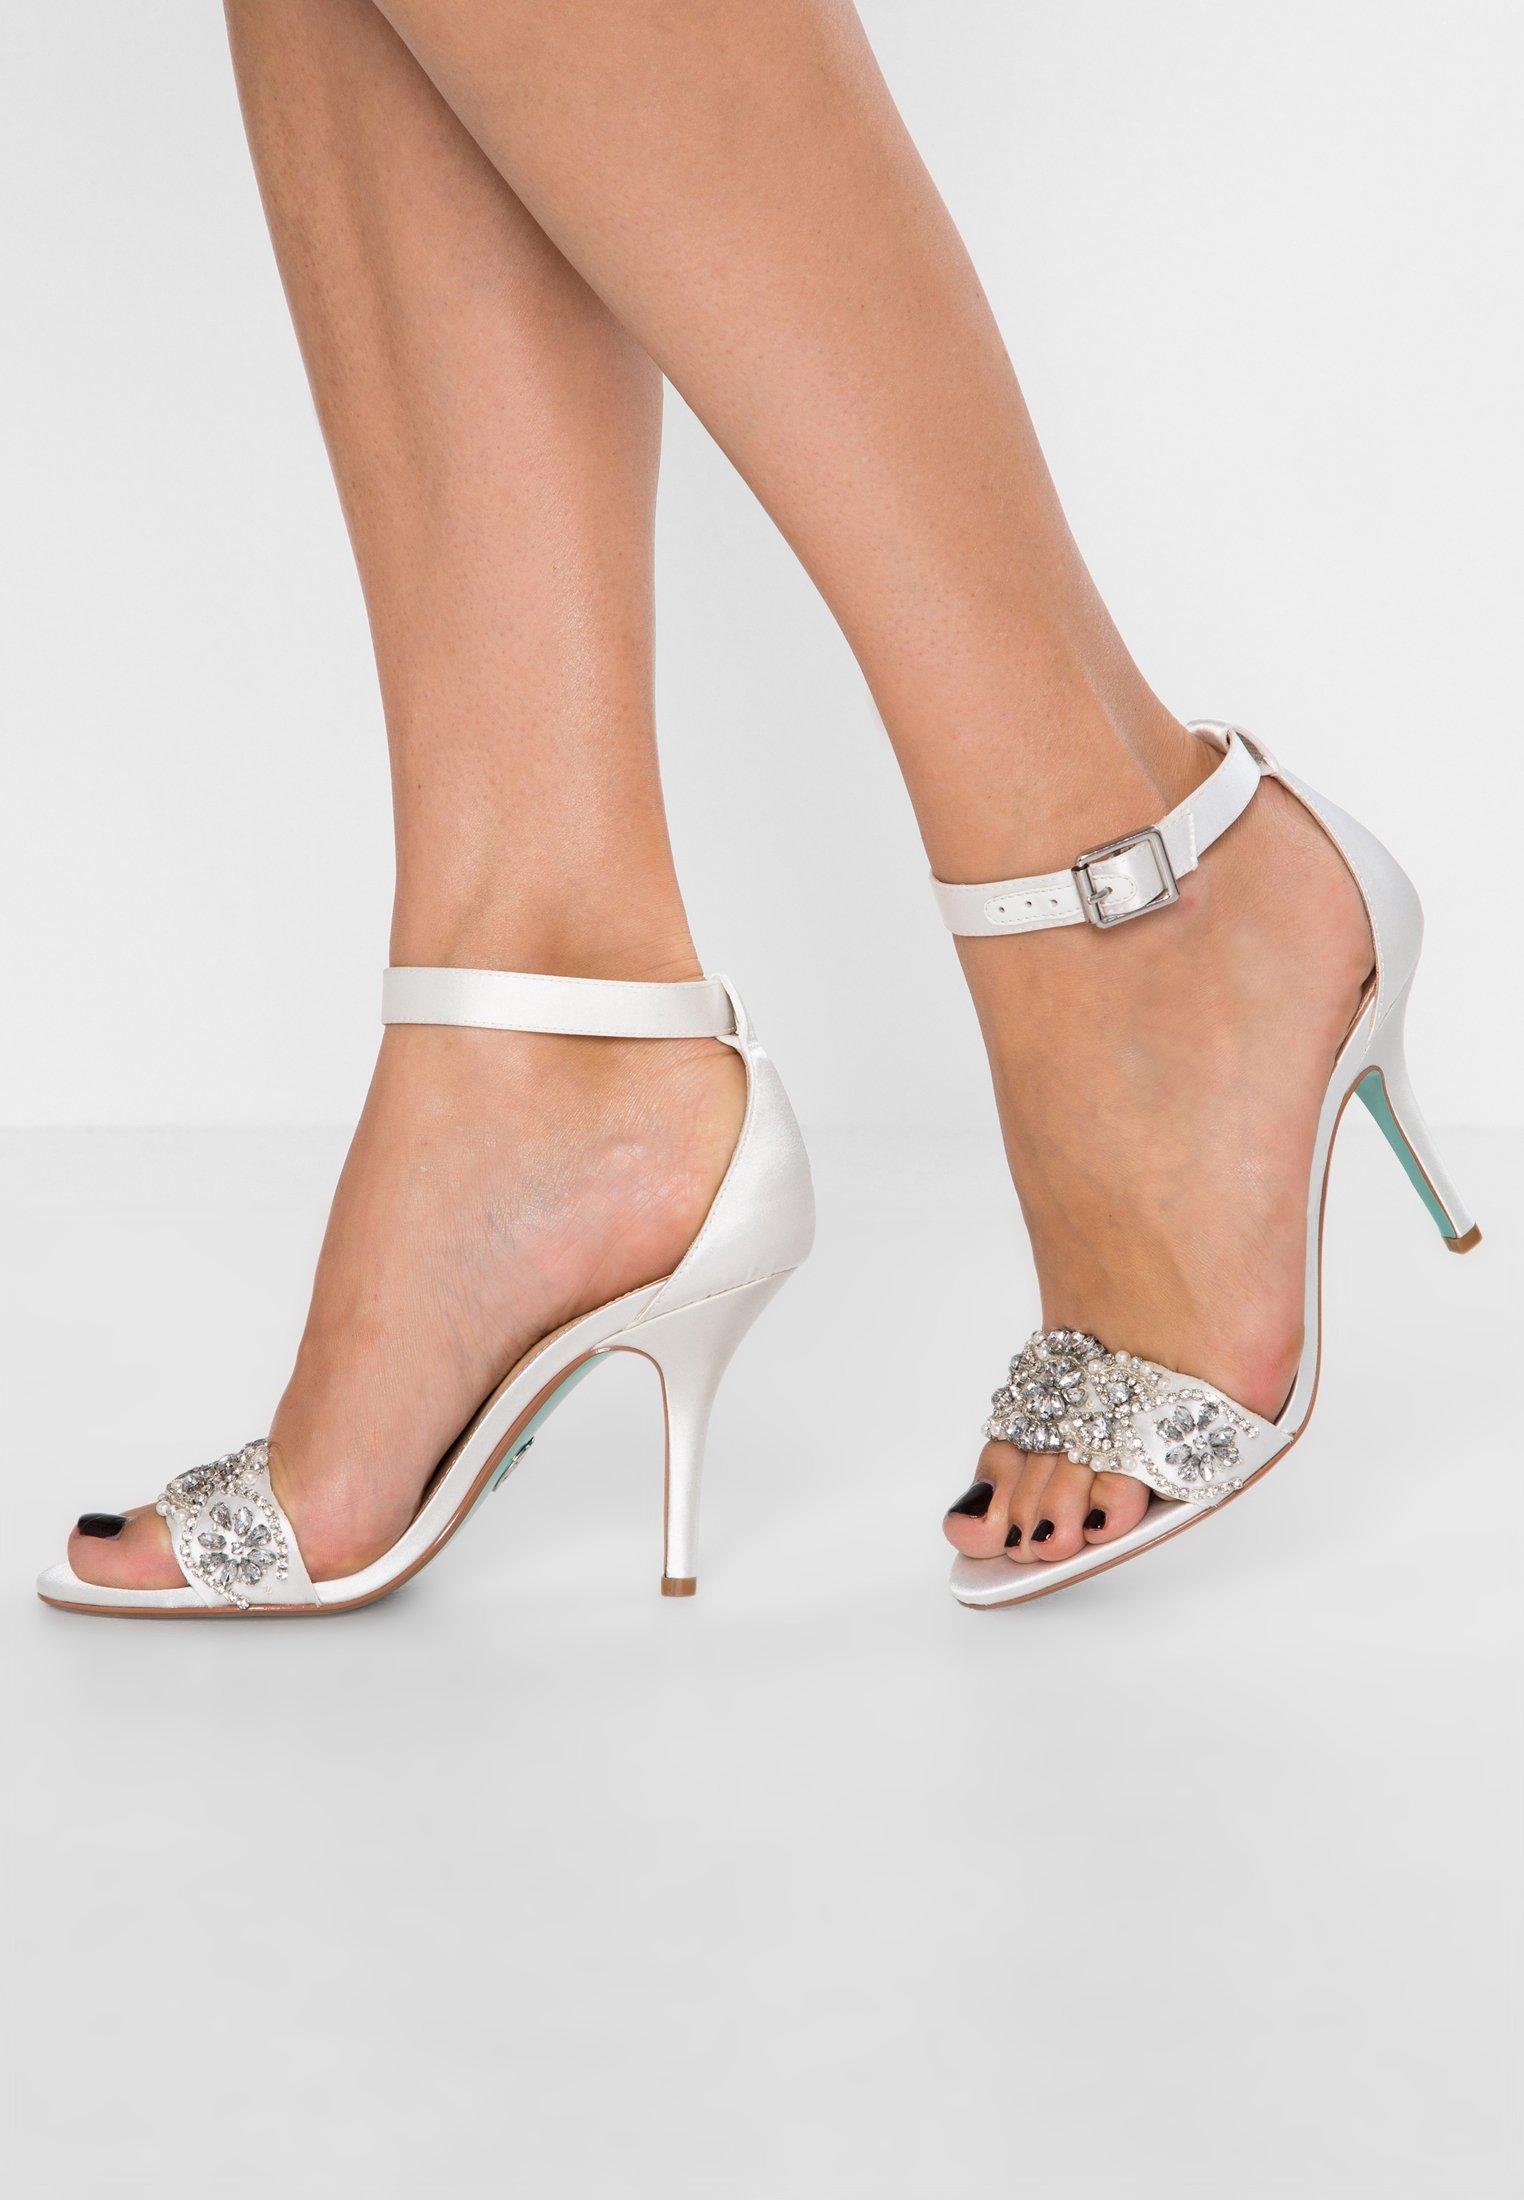 Women GINA - High heeled sandals - ivory